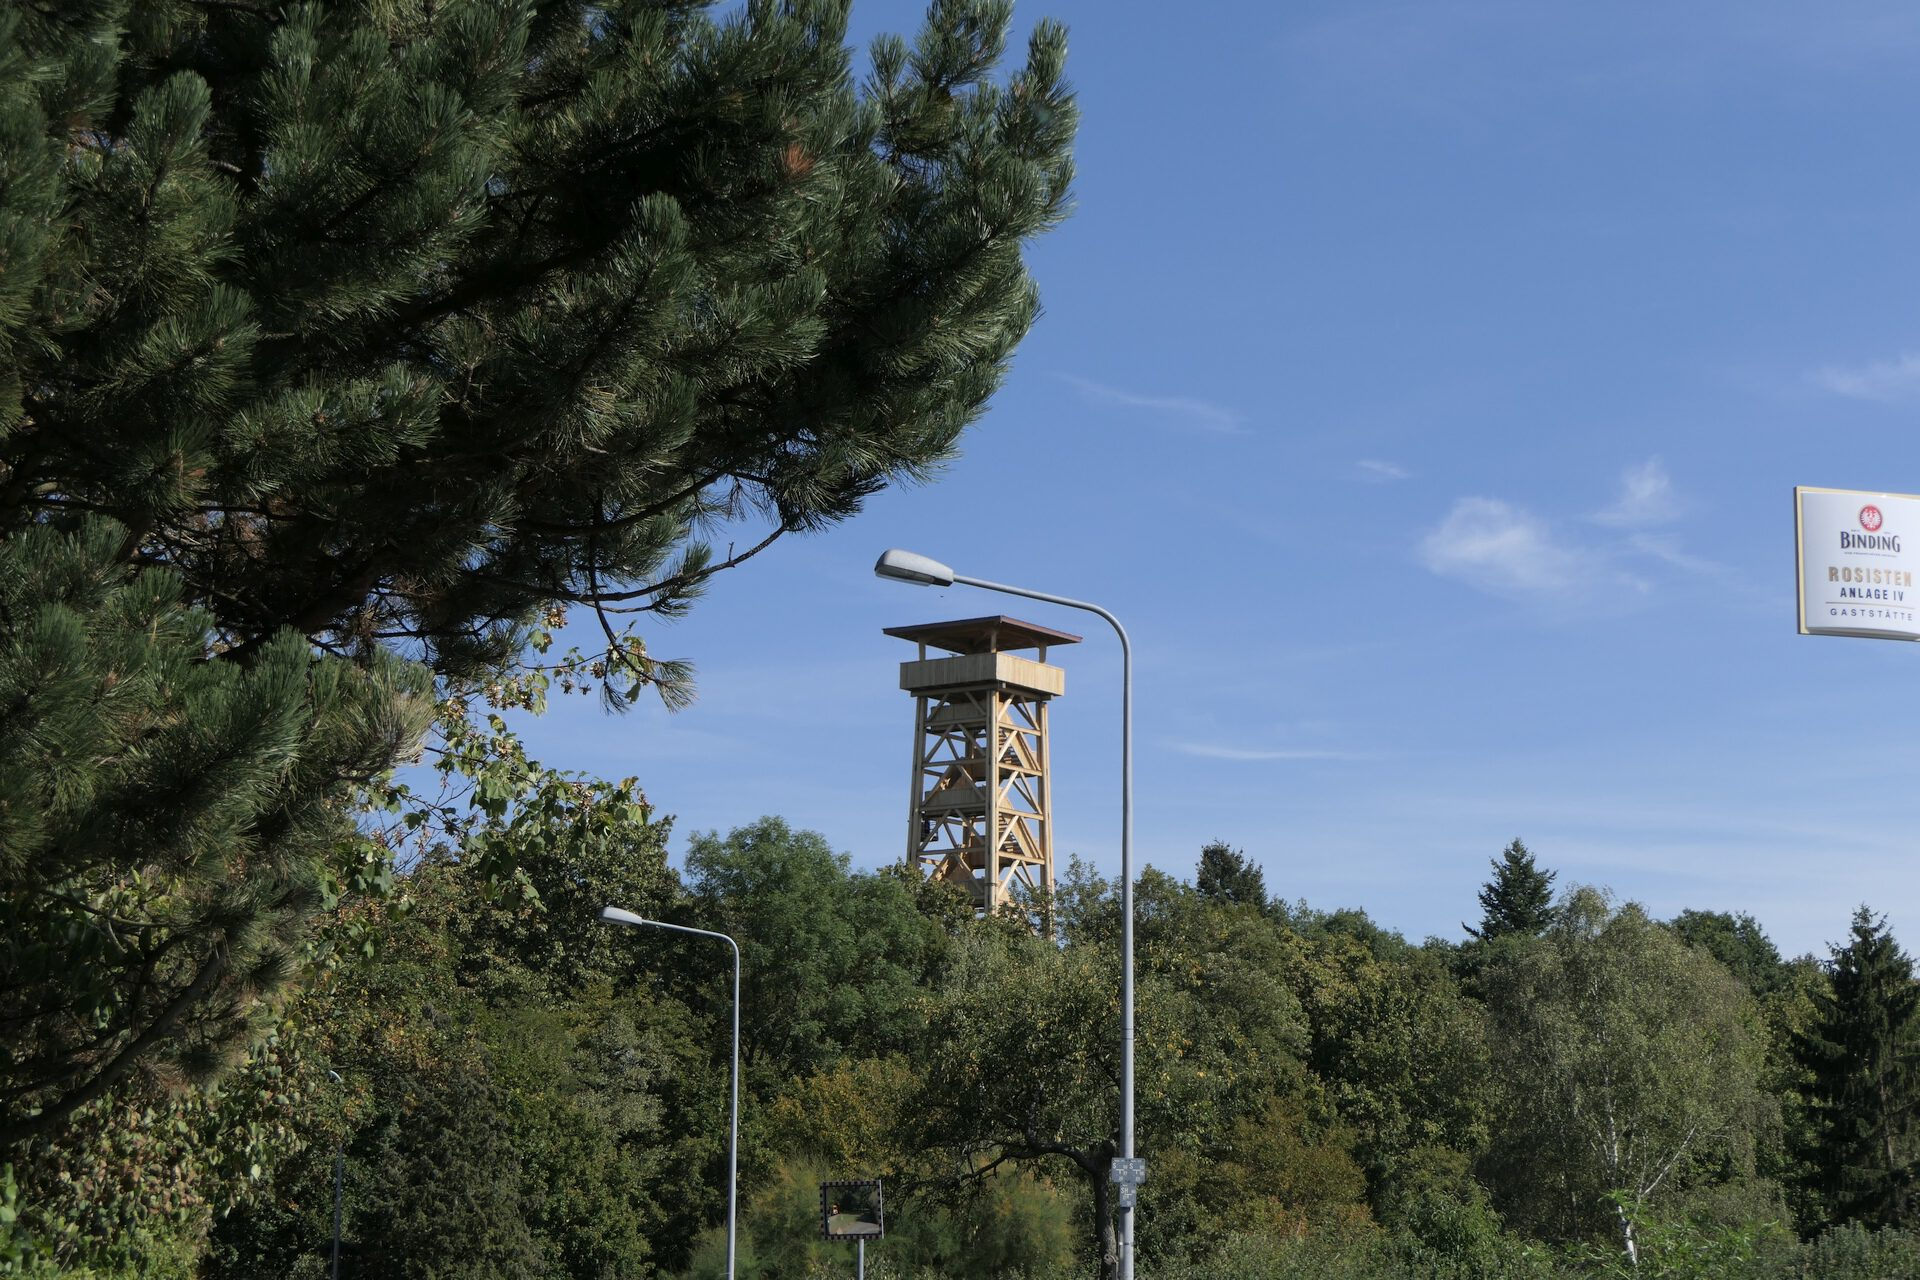 Neuer Goetheturm in Frankfurt am Main Sachsenhausen